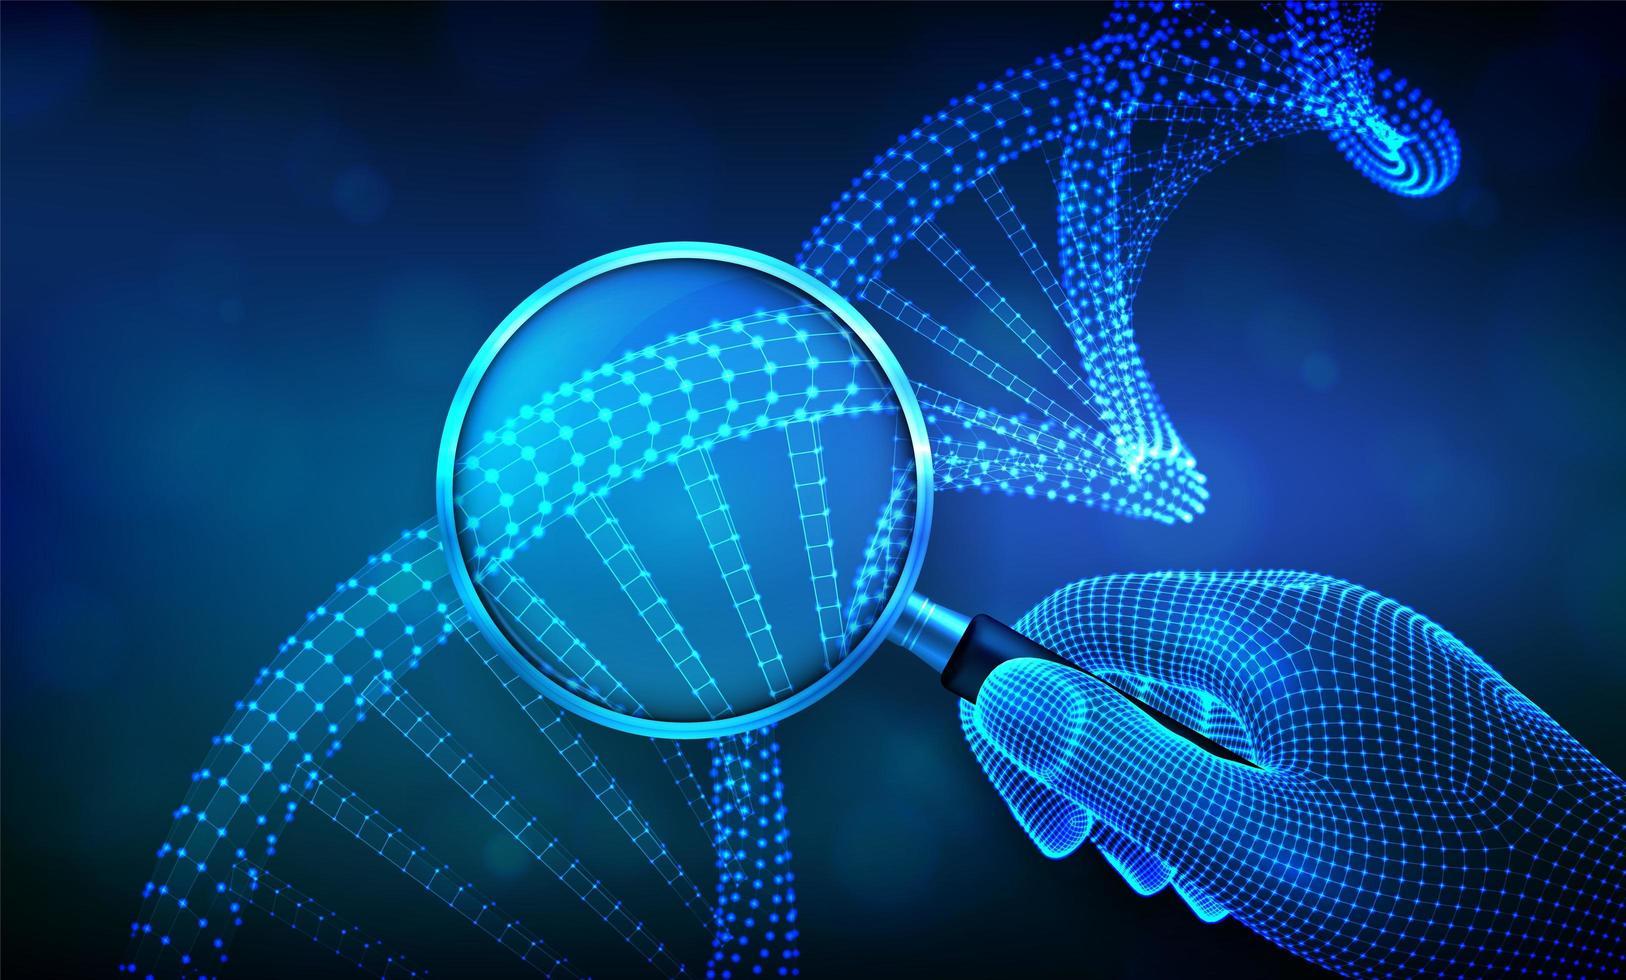 concepto de ingeniería genética banner futurista con adn vector